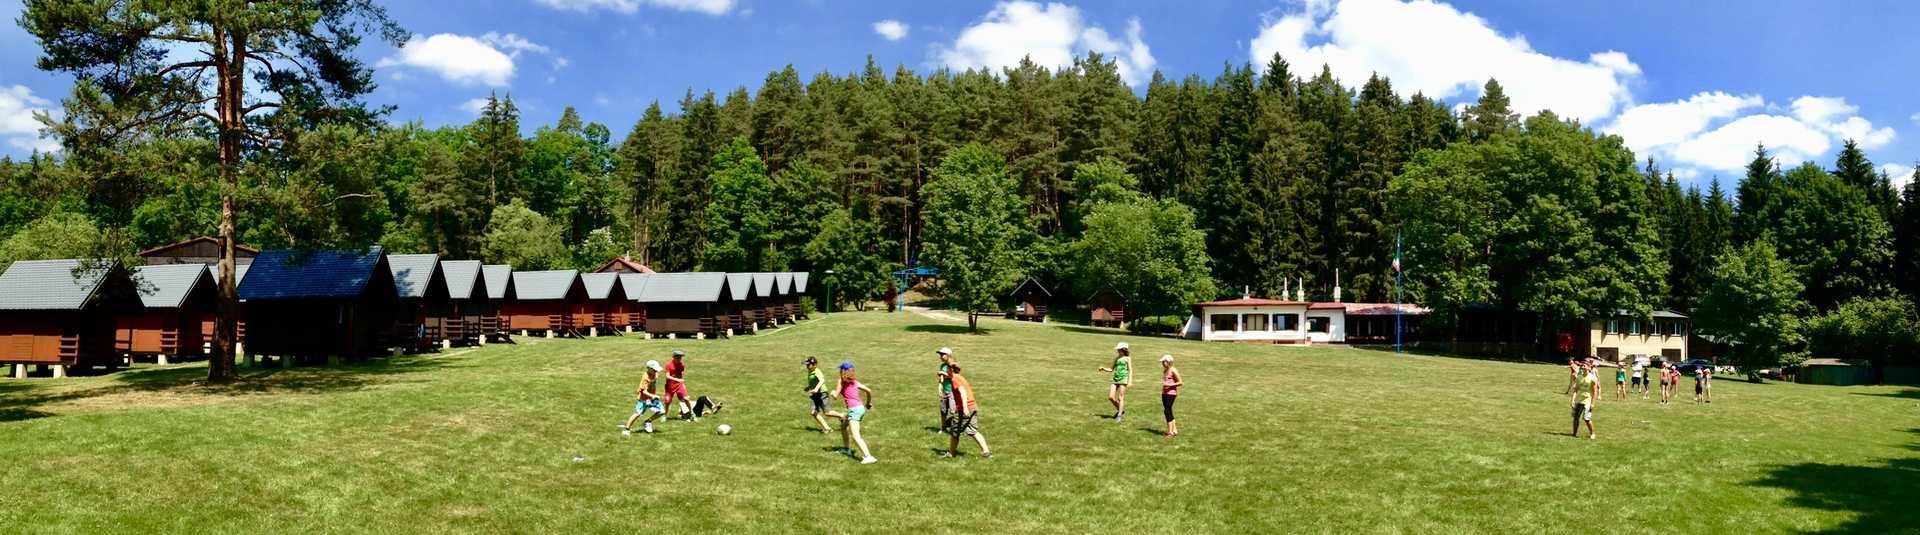 Syka Agency Letni Tabory Summer Time Camps